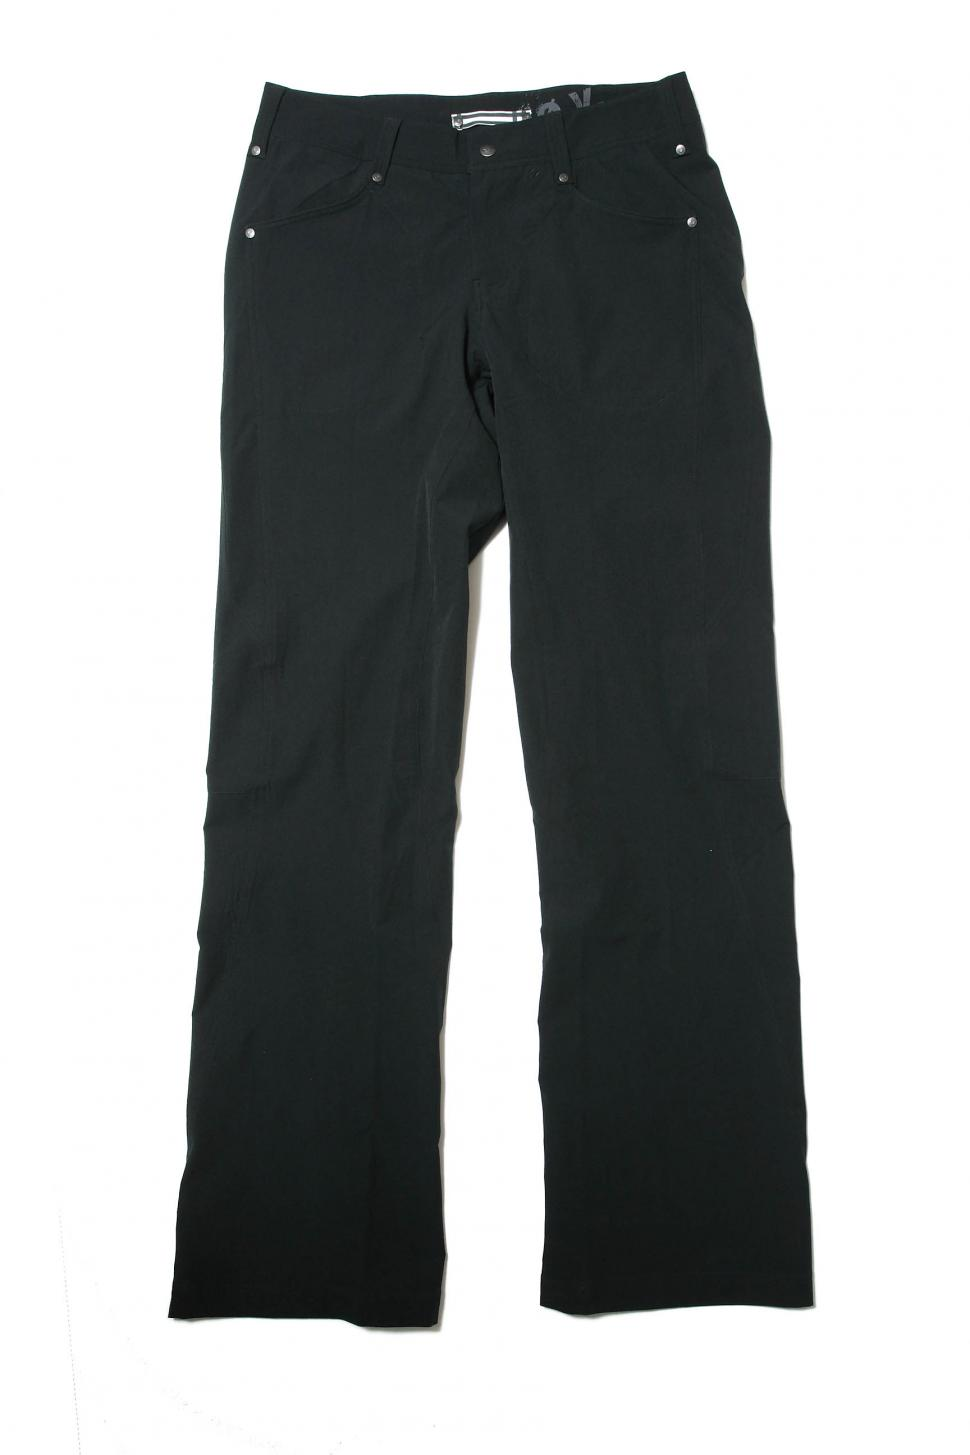 Sugoi HOV womens pants